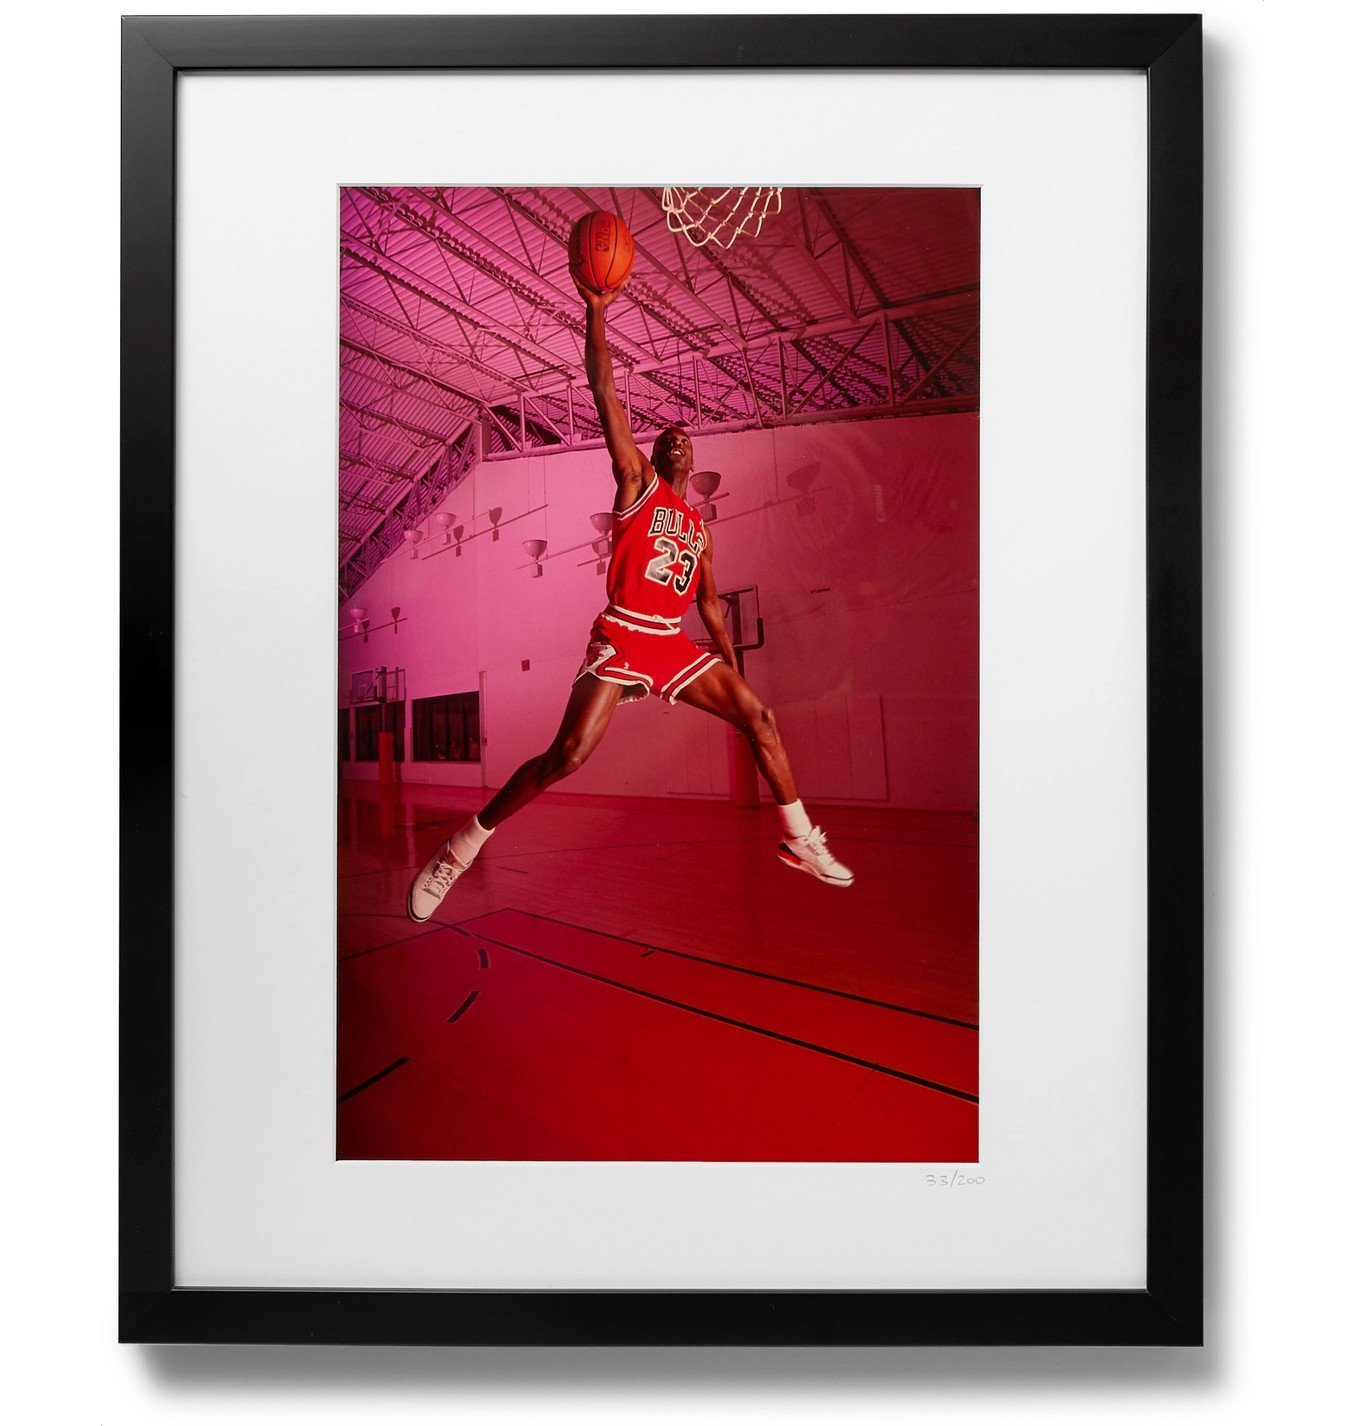 "Photo: Sonic Editions - Framed 1988 Michael Jordan Dunk Print, 16 x 20"""" - Multi"